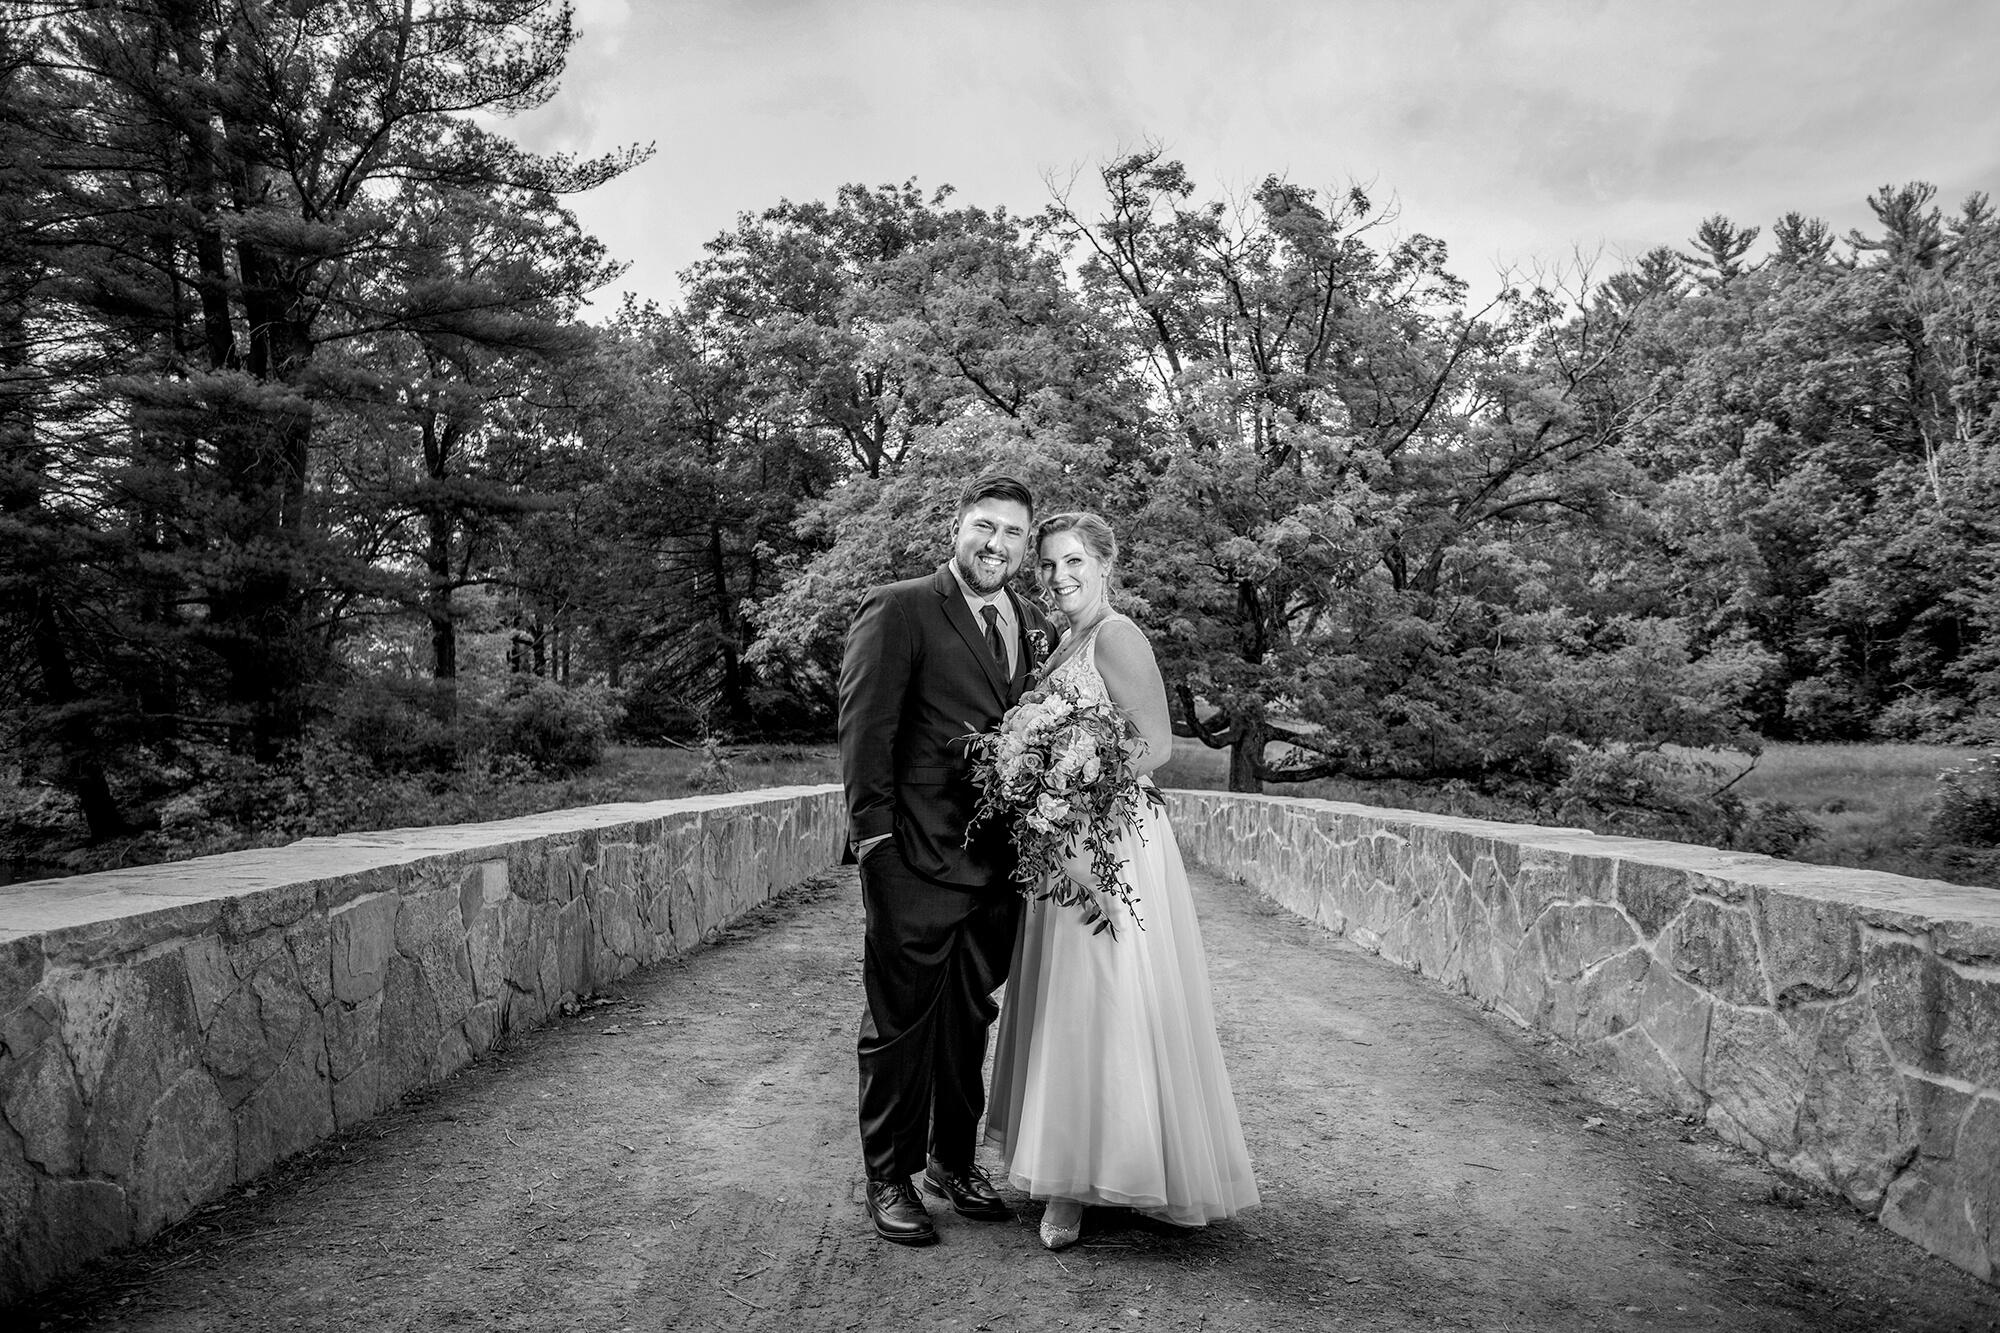 Wedding photography of the couple on a stone bridge